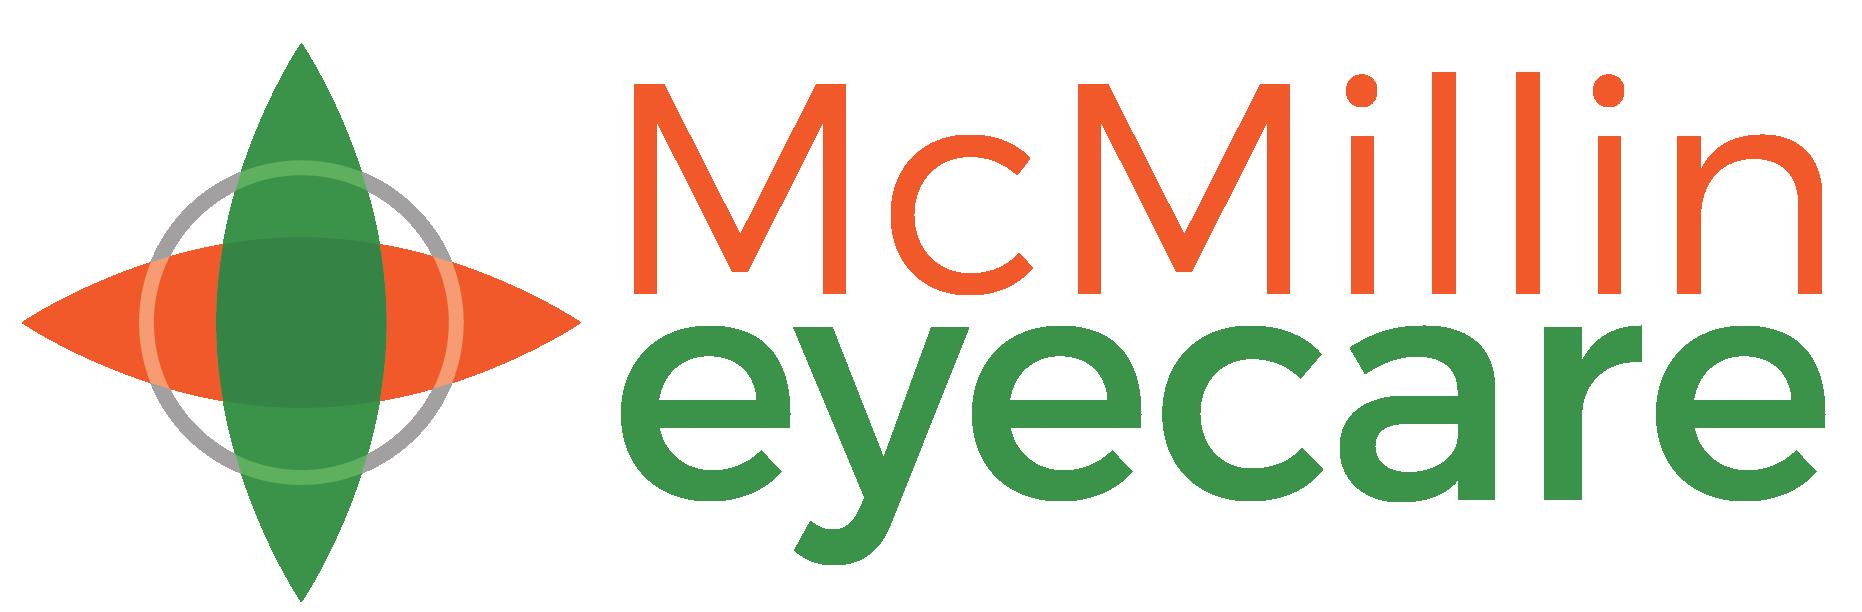 McMillin Eyecare Logo - Color